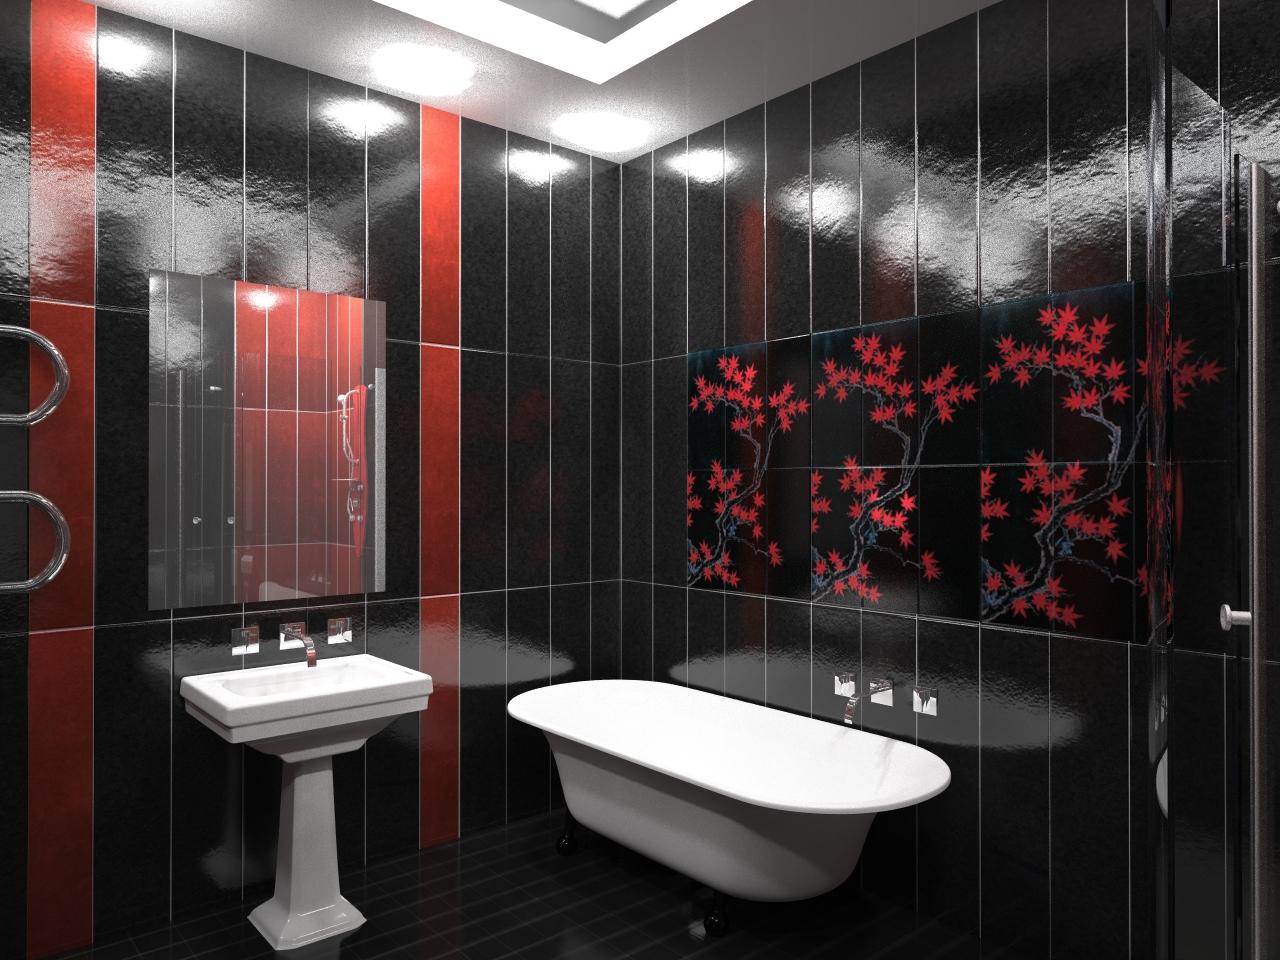 Ванная комната - Фото галереи ...: designa.moy.su/photo/vannaja_komnata/2